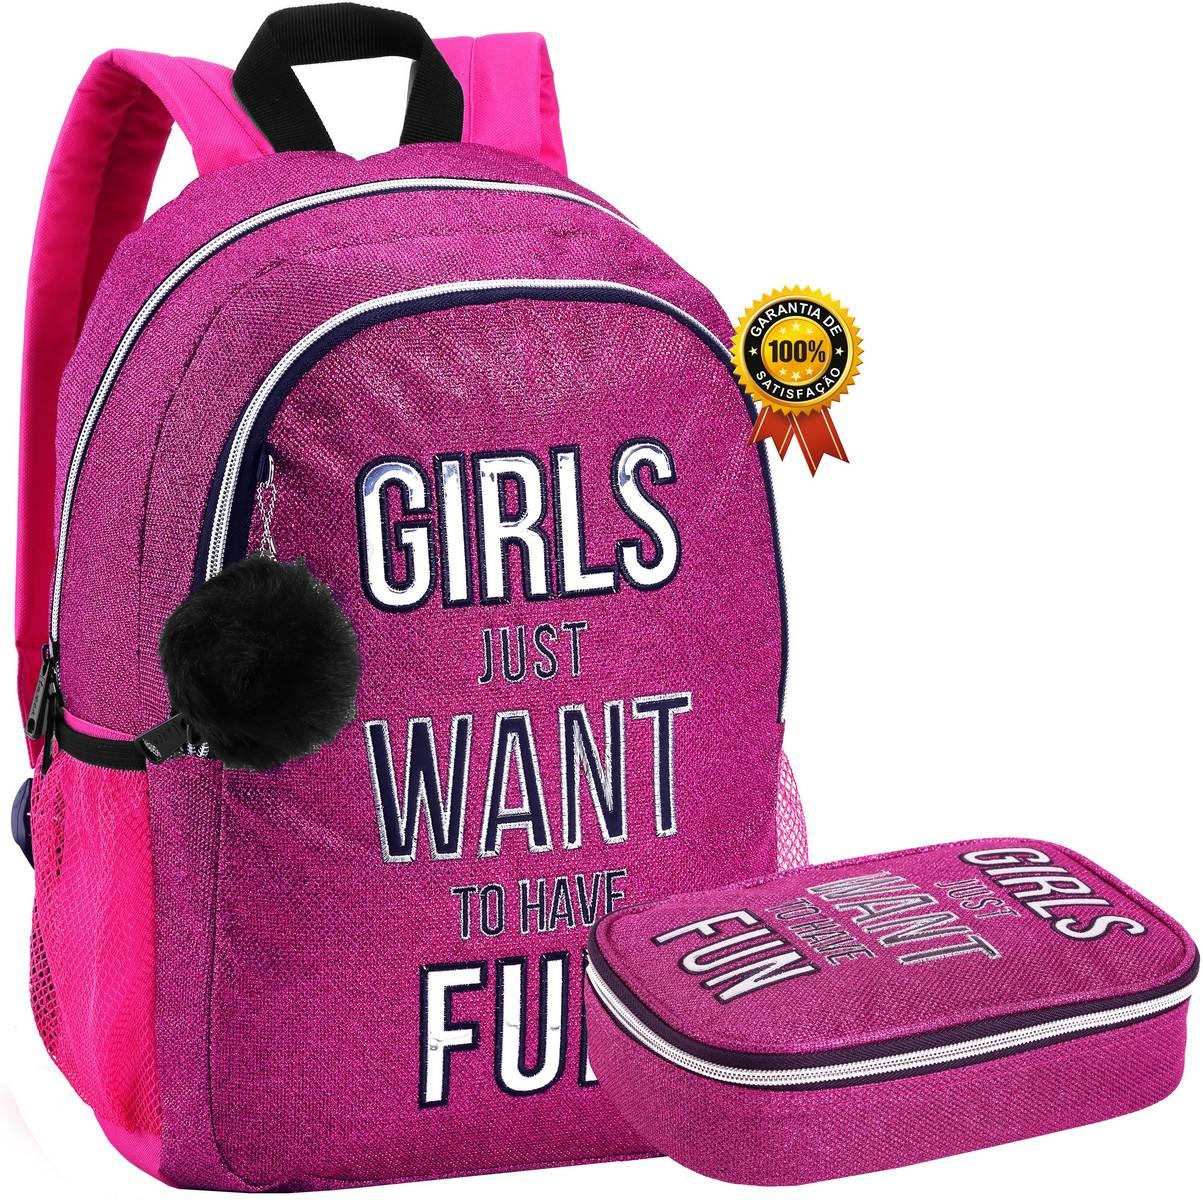 Kit Conjunto Mochila Feminina Juvenil Impermeável Escolar Costas Brilhosa Chaveiro Pom Pom + Estojo Grande Resistente Glitter Lançamento Seanite